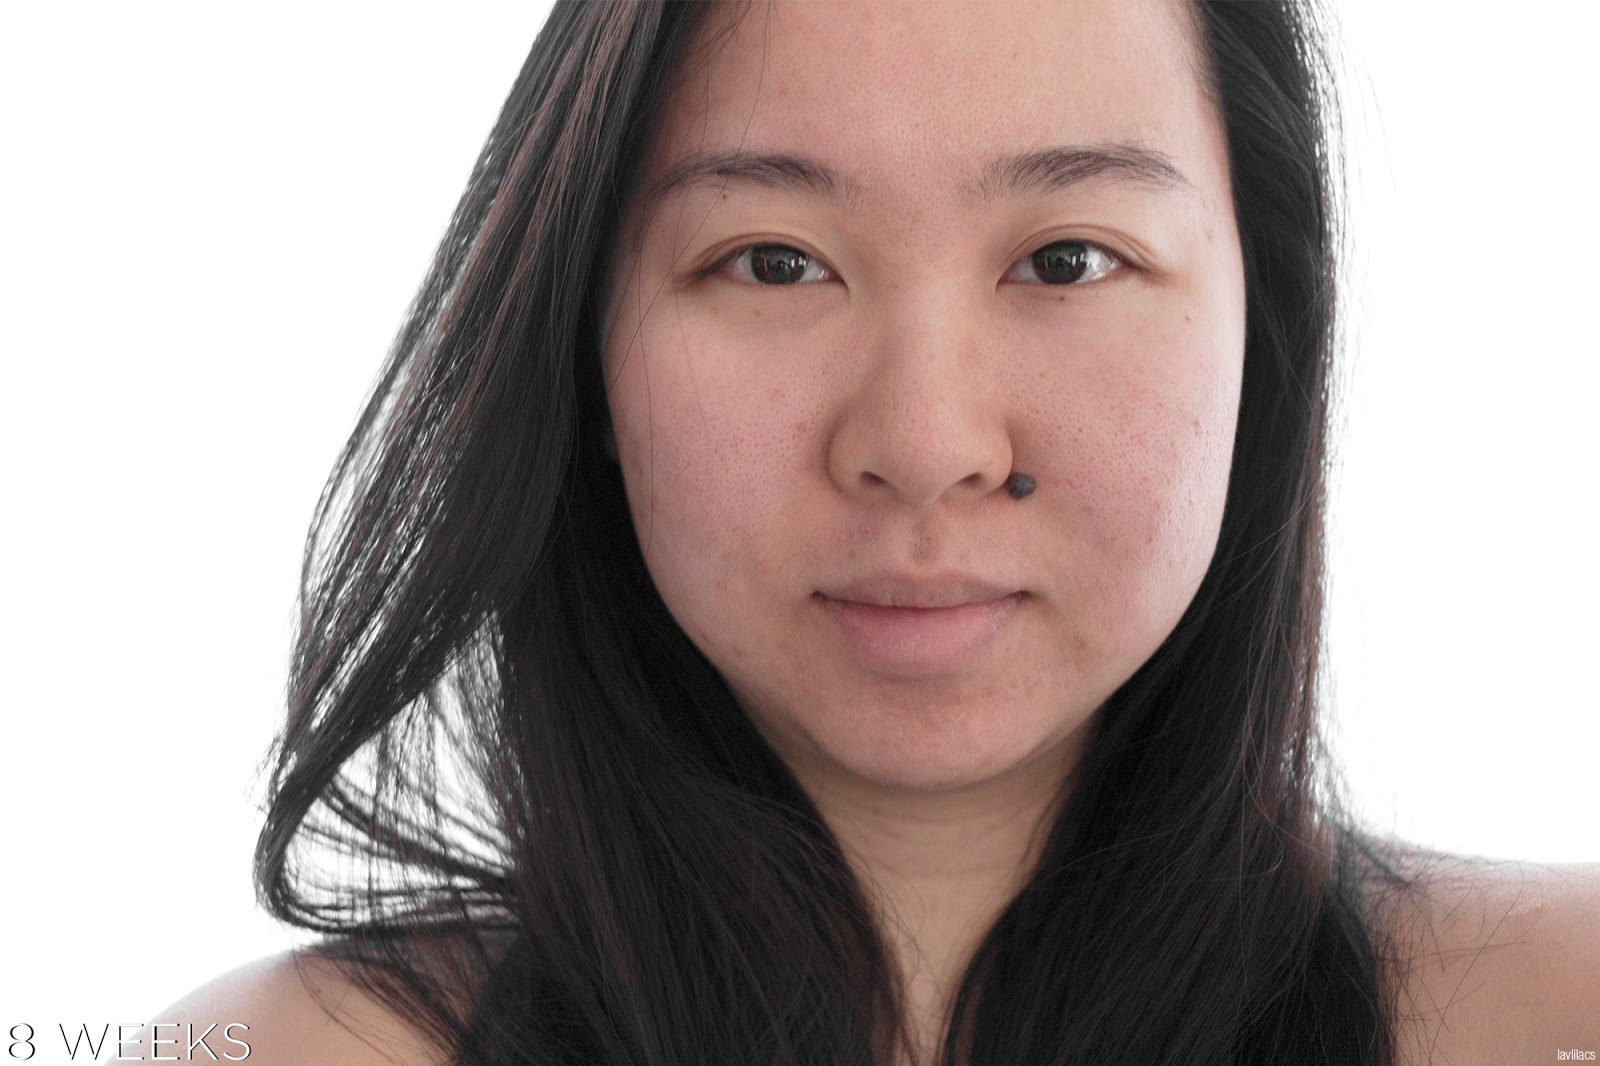 tria Hair Removal Laser Facial Hair 8 Weeks